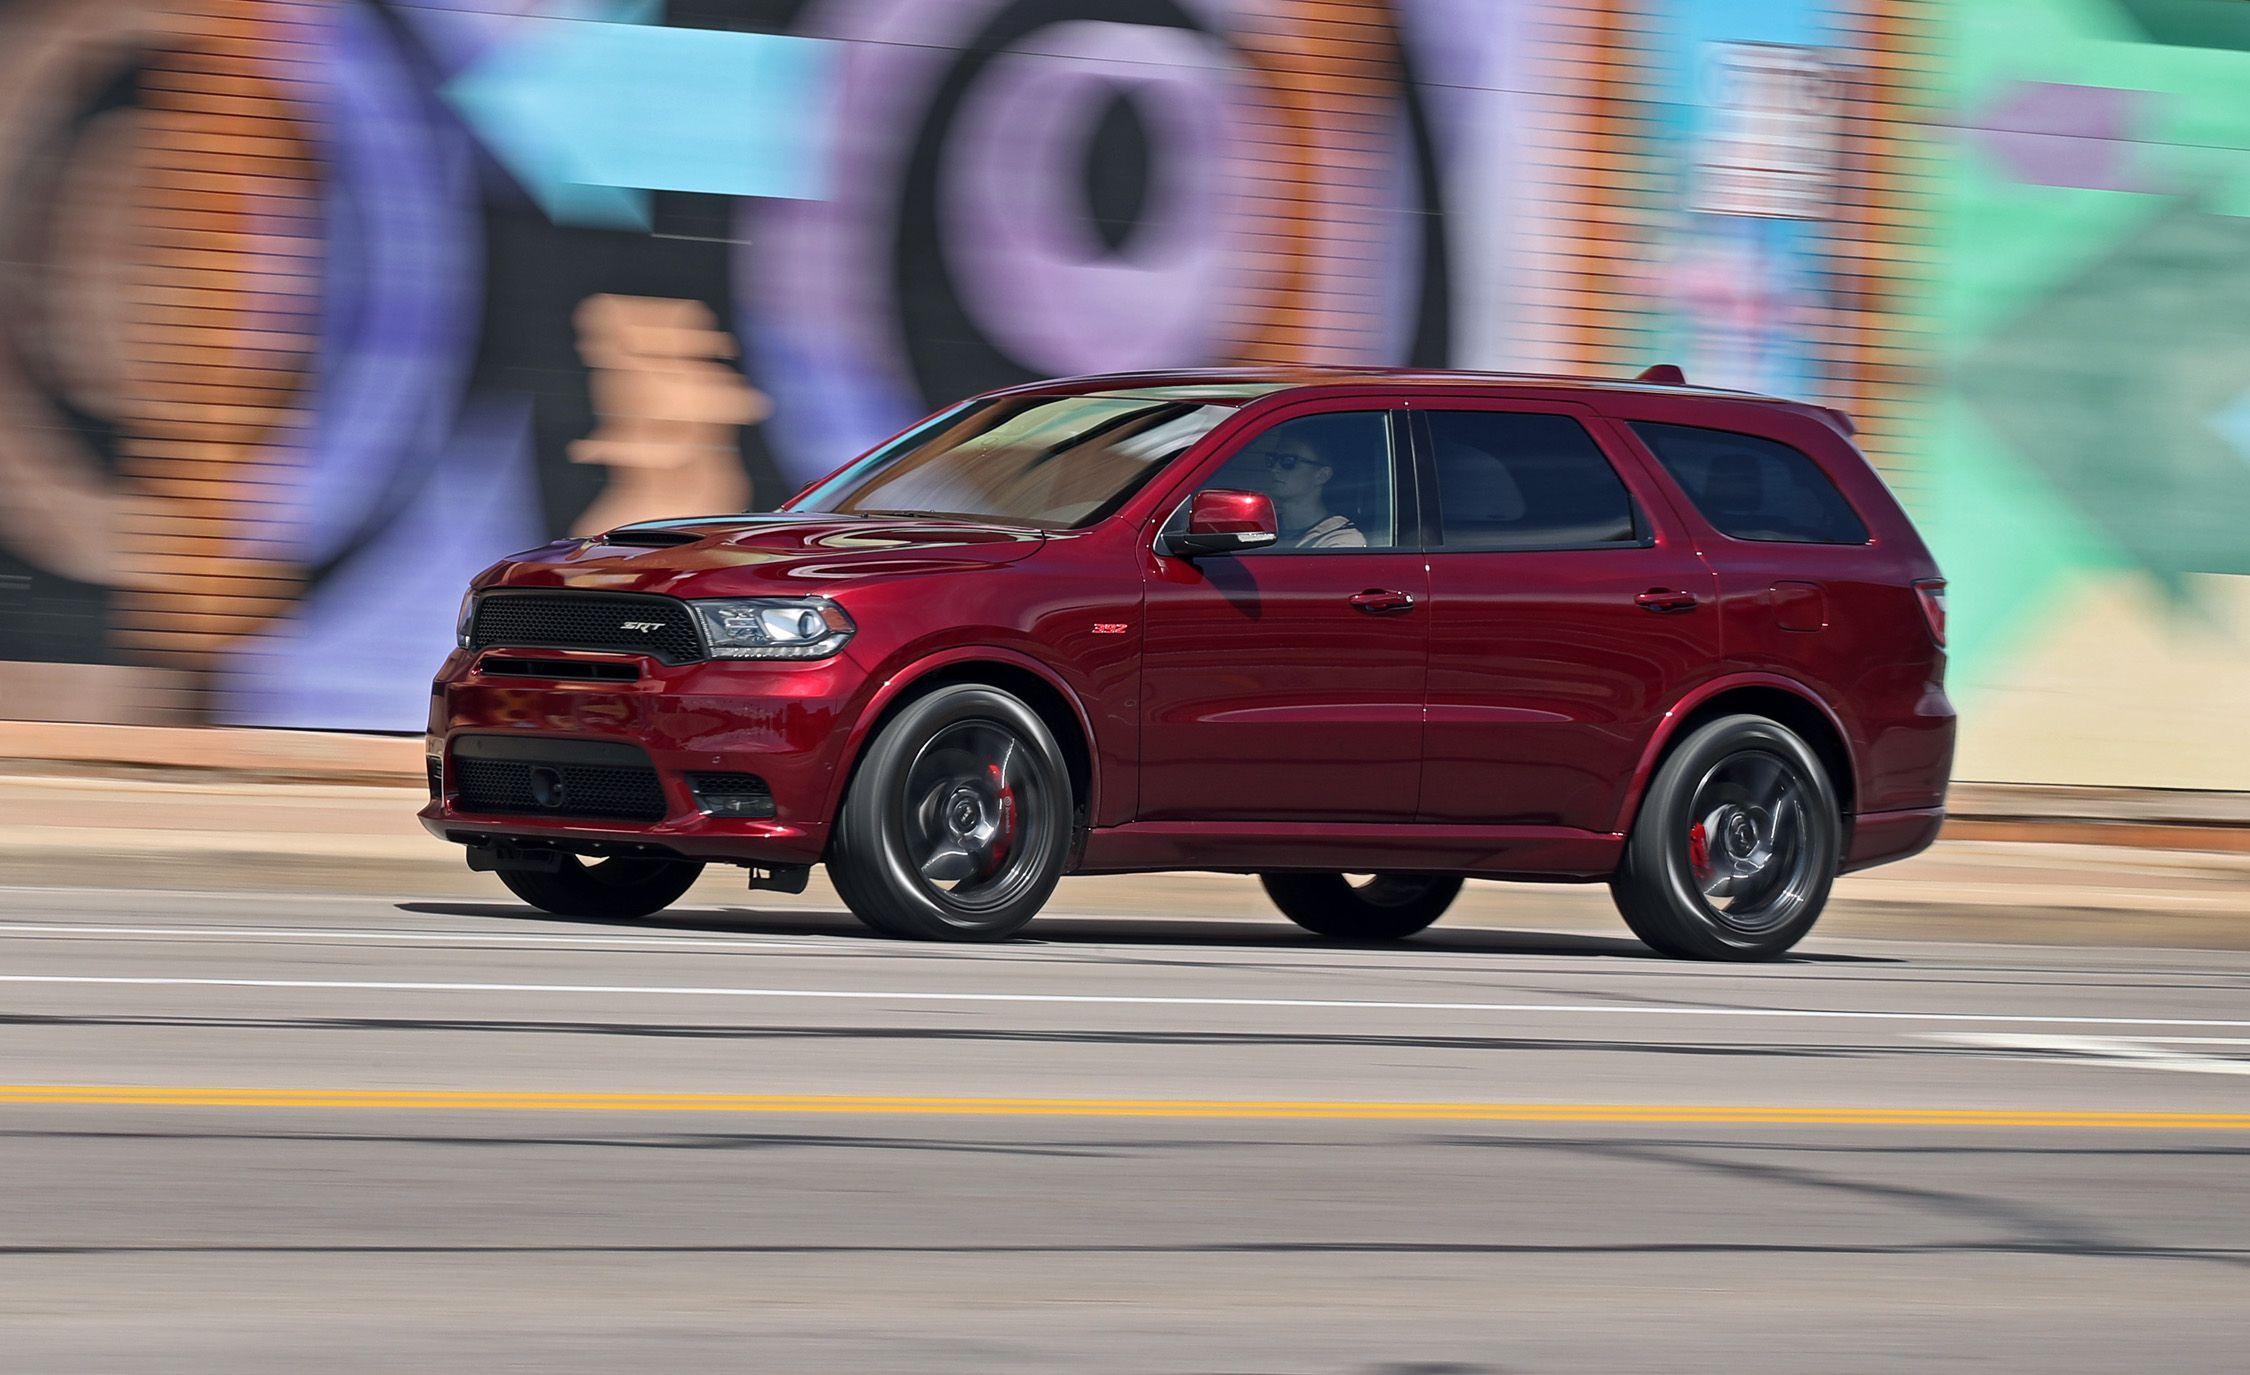 2018 Dodge Durango SRT Test | Review | Car and Driver